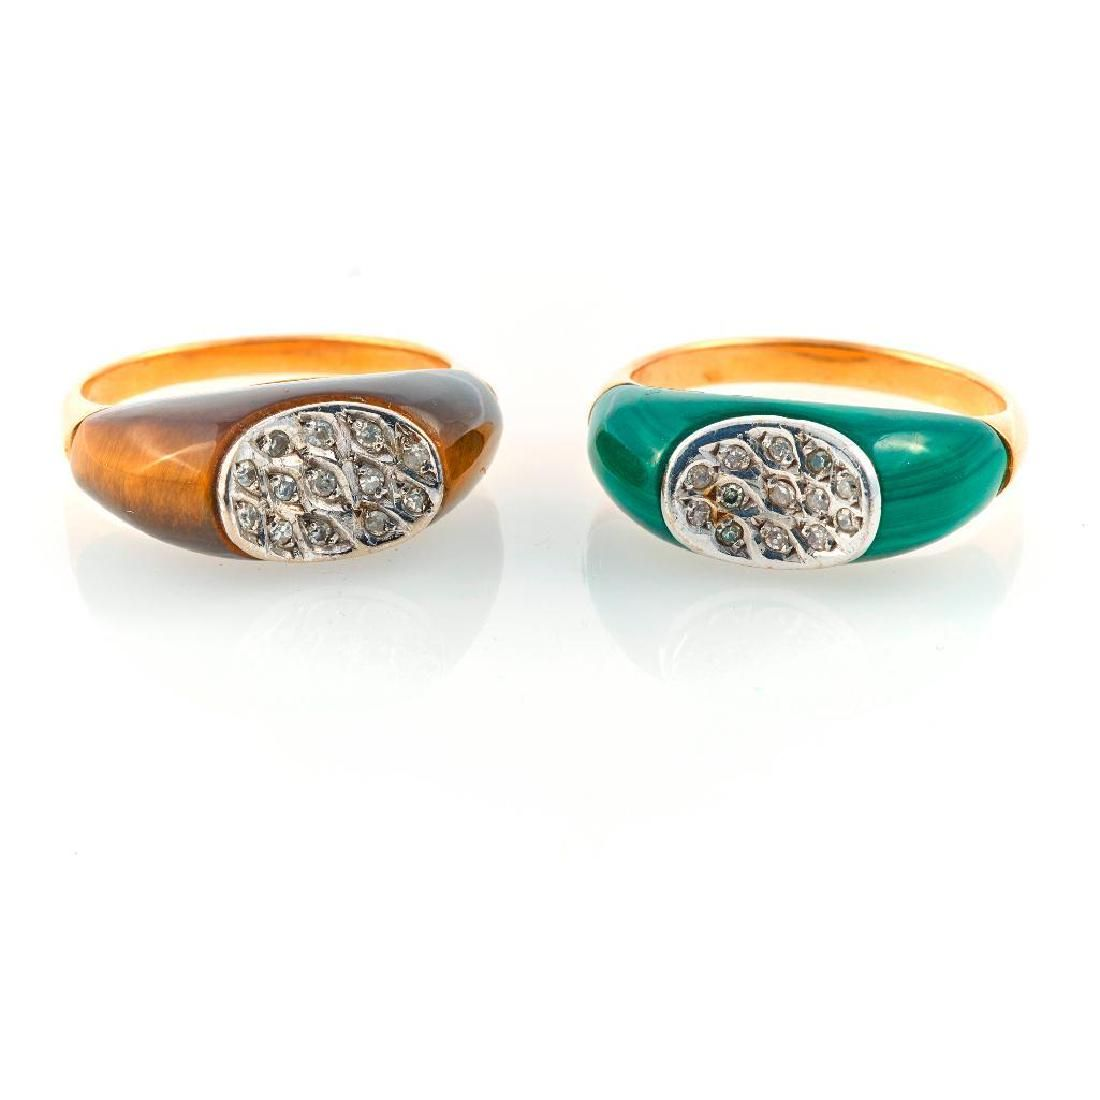 Pair of malachite, tiger's eye/diamond & 18k gold rings